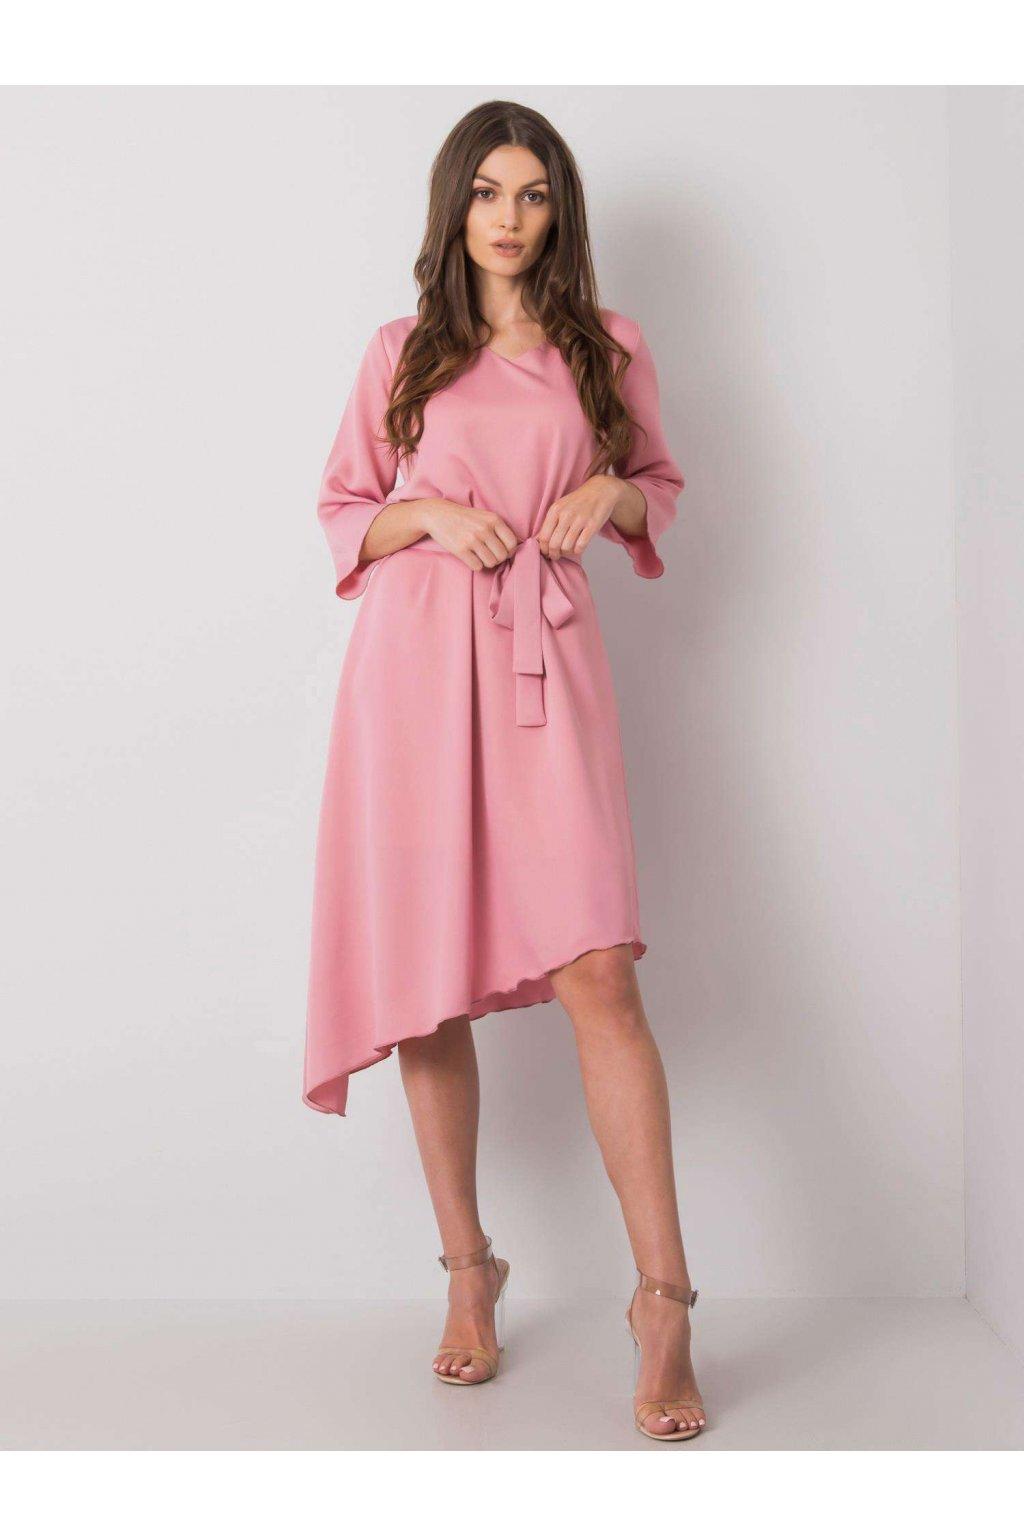 pol pl Brudnorozowa sukienka Imene 367006 2